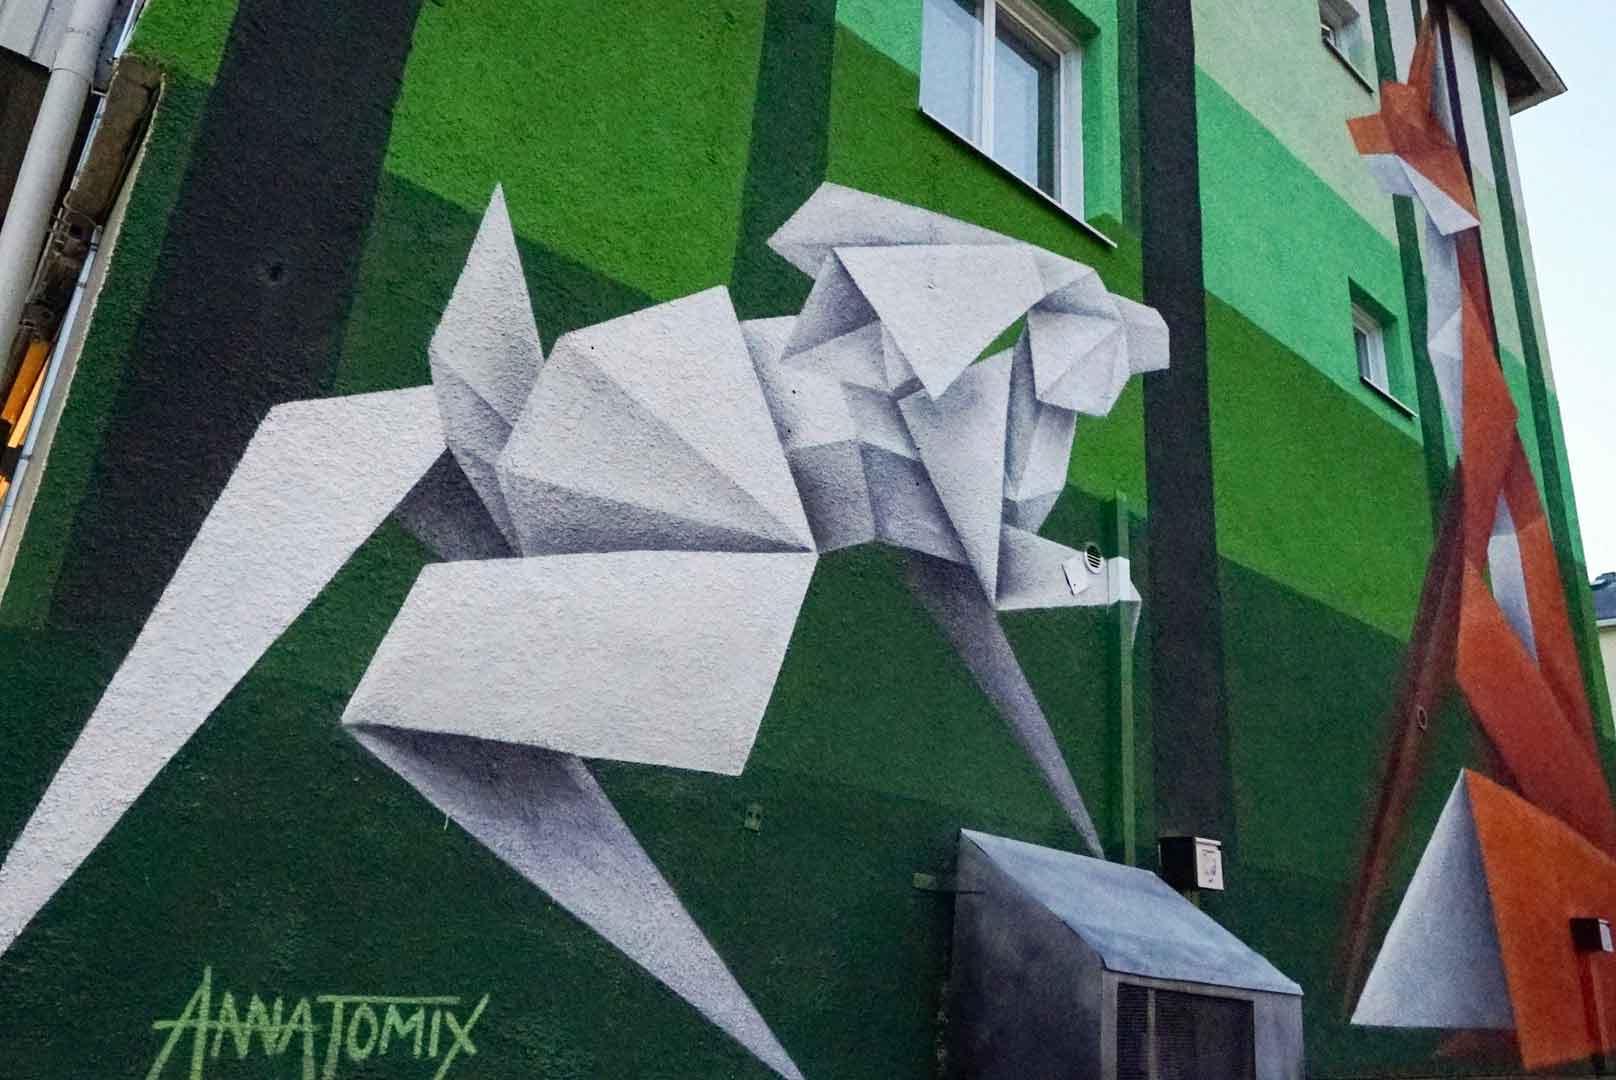 annatomix_ Artscape_2017-08-11_FredrikÅkerberg_1080×1616.jpg